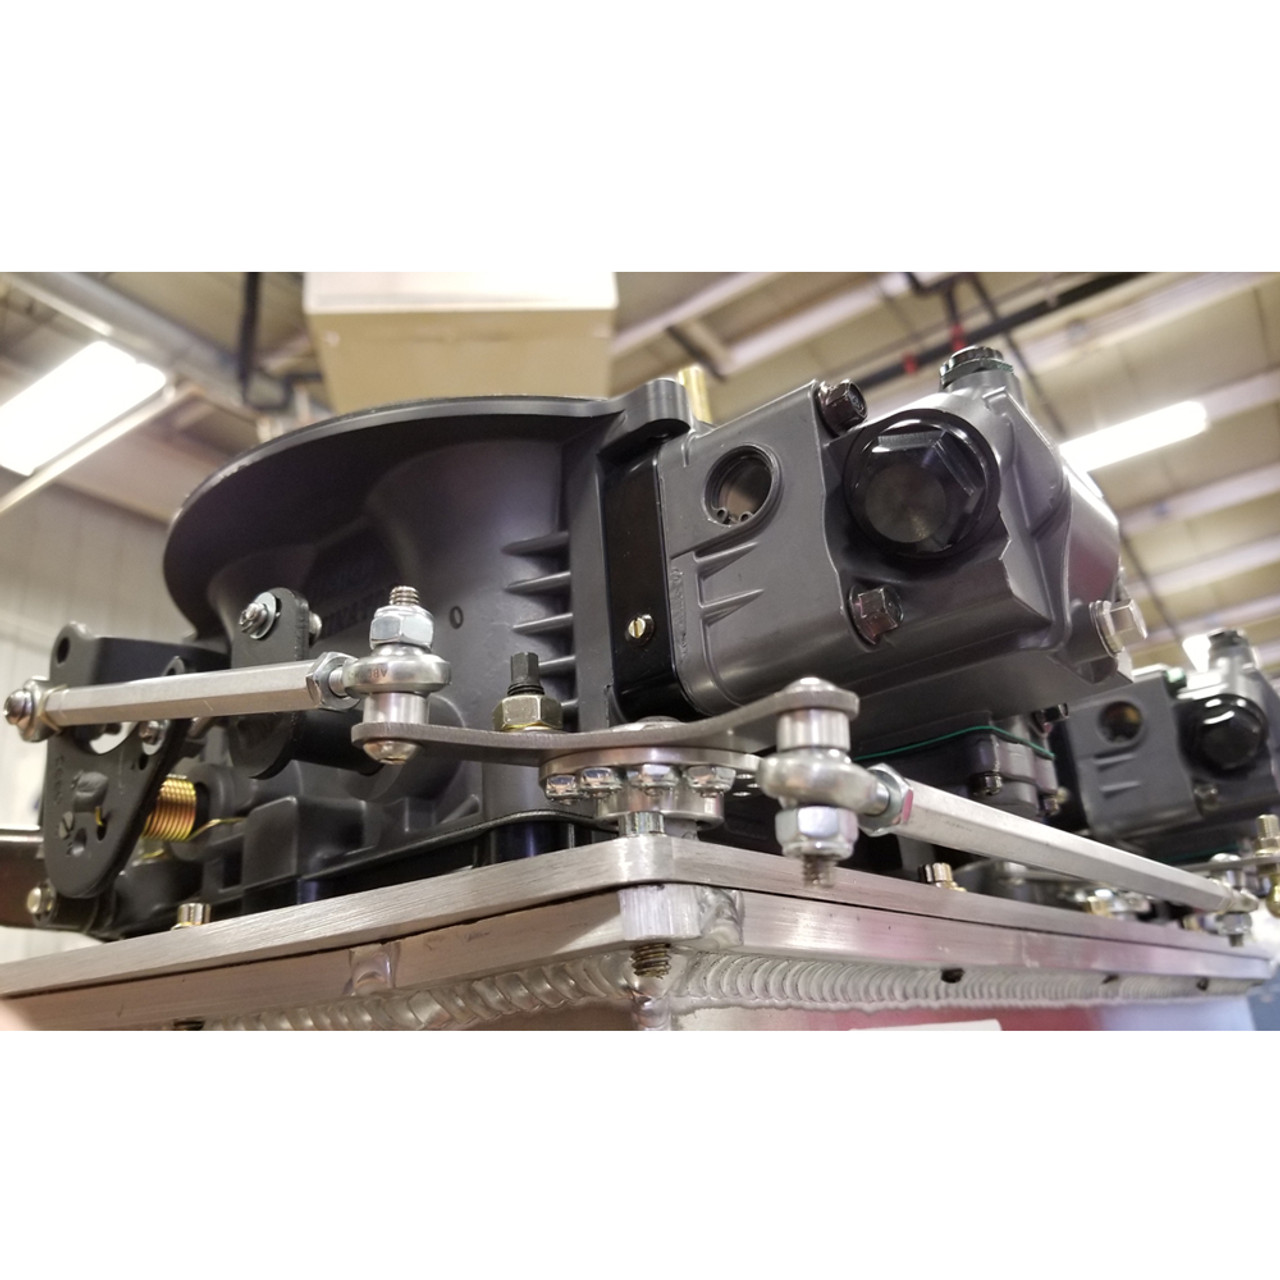 dual bell crank throttle linkage kit installed  [ 1000 x 1000 Pixel ]